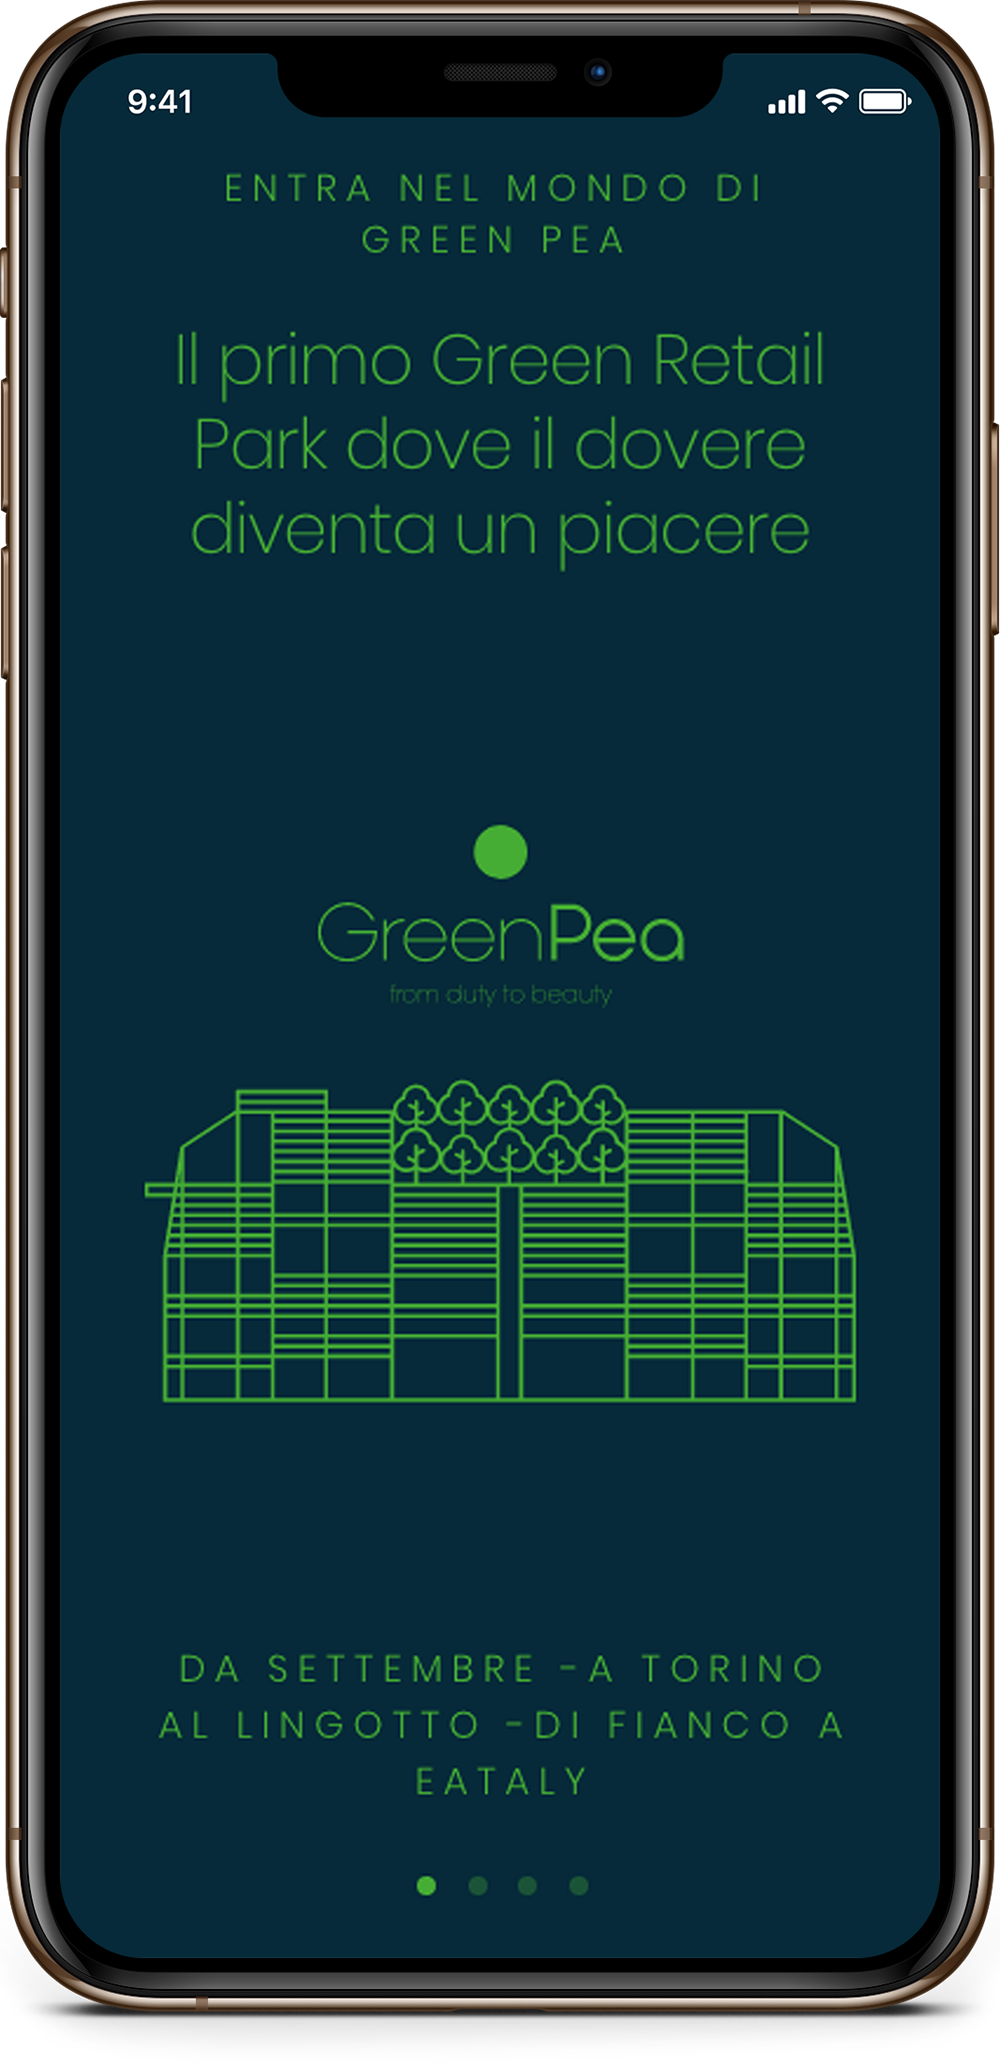 Green Pea app details